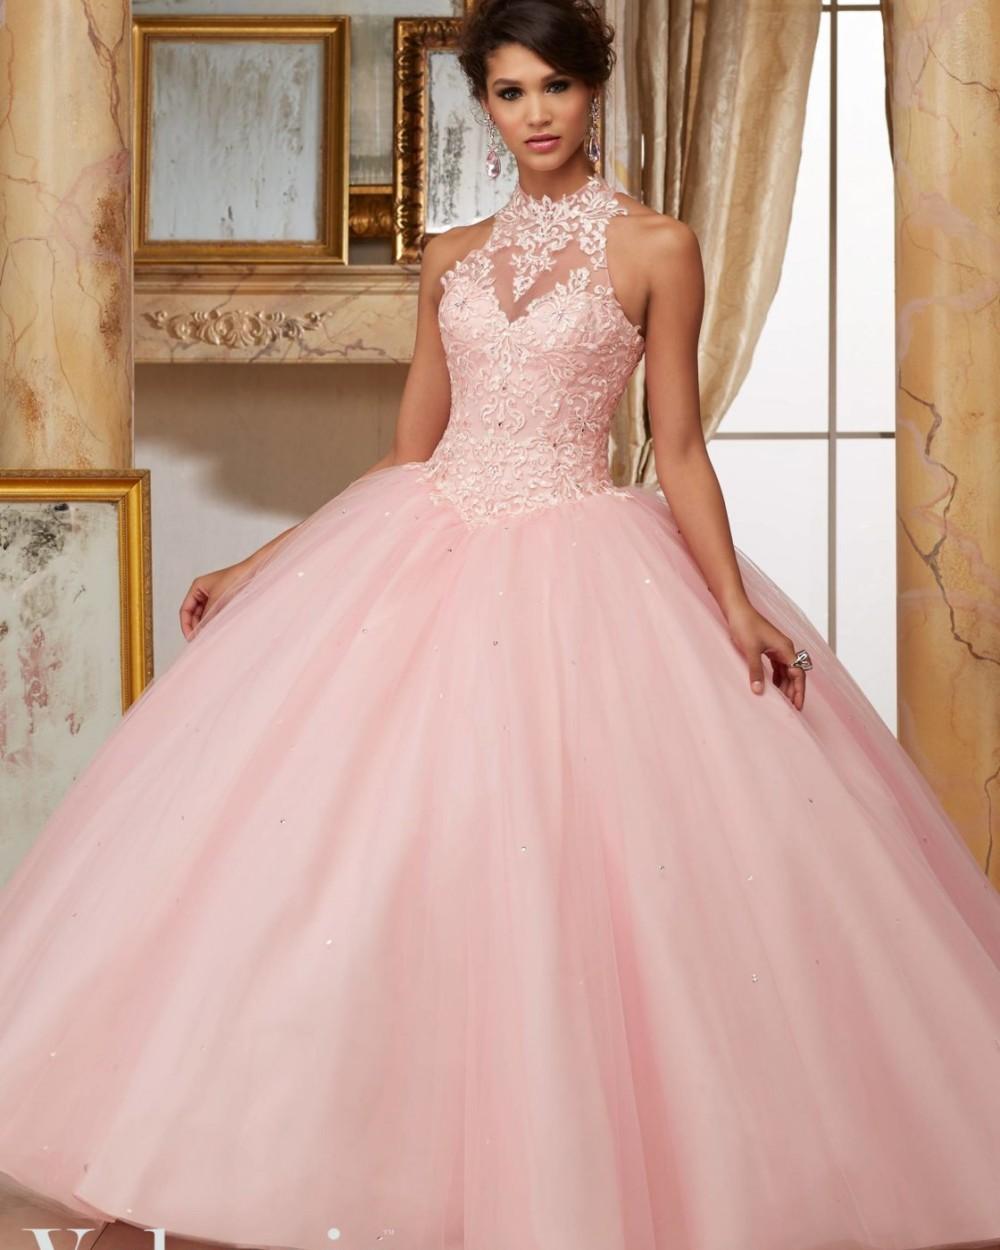 Aliexpress.com : Buy Light Pink Corset Quinceanera Dress Simple ...